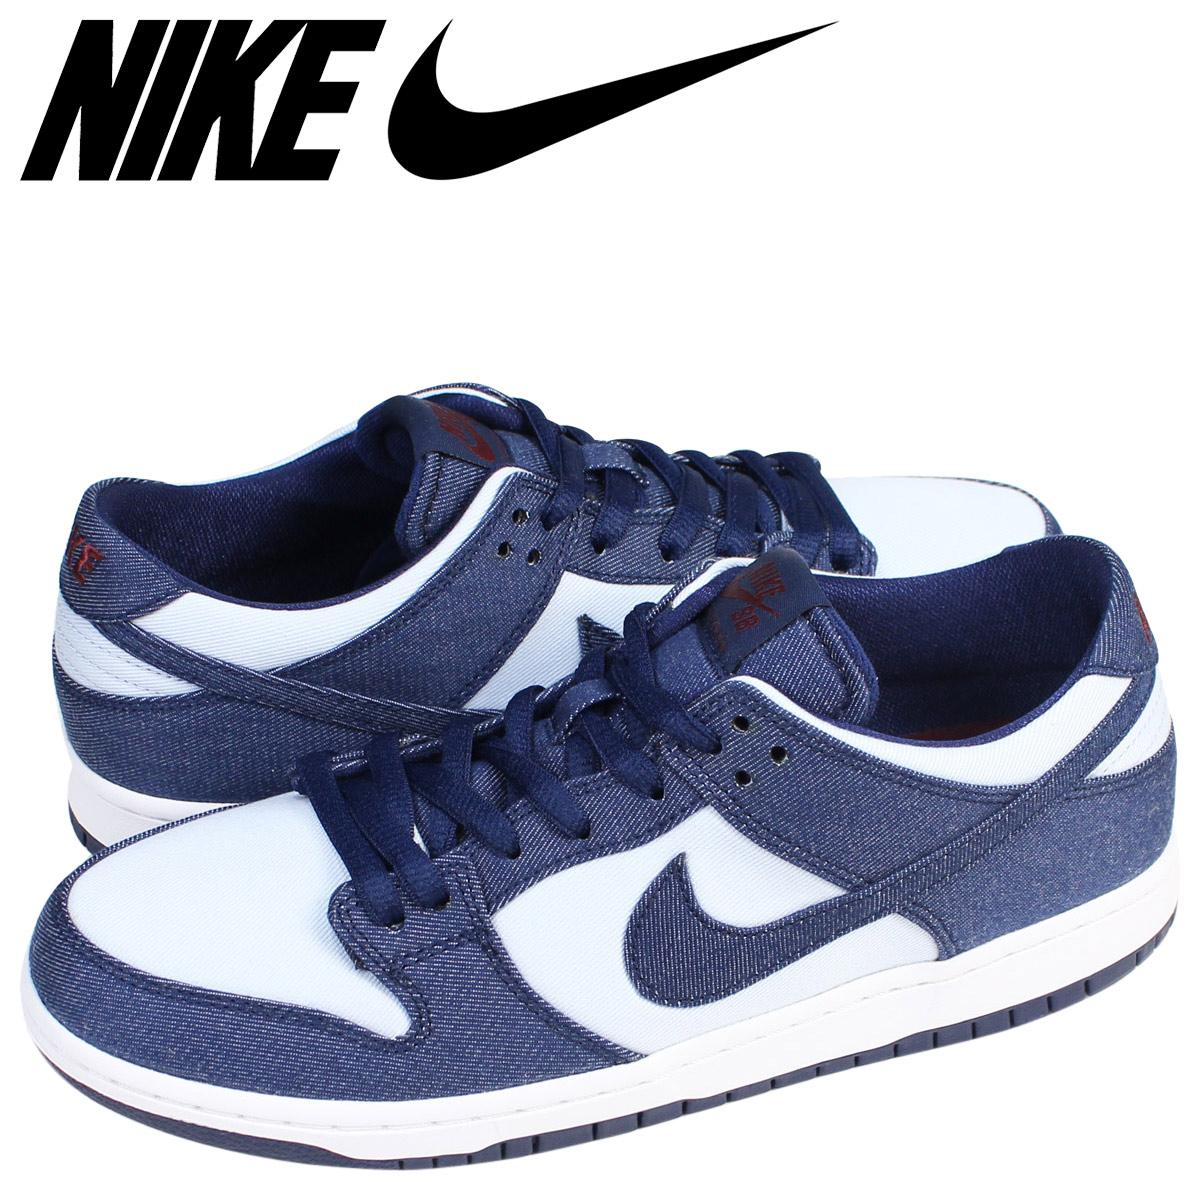 NIKE ナイキ SB ダンク ロー スニーカー ZOOM DUNK LOW PRO BINARY BLUE 854866-444 メンズ 靴 ブルー 【zzi】【返品不可】